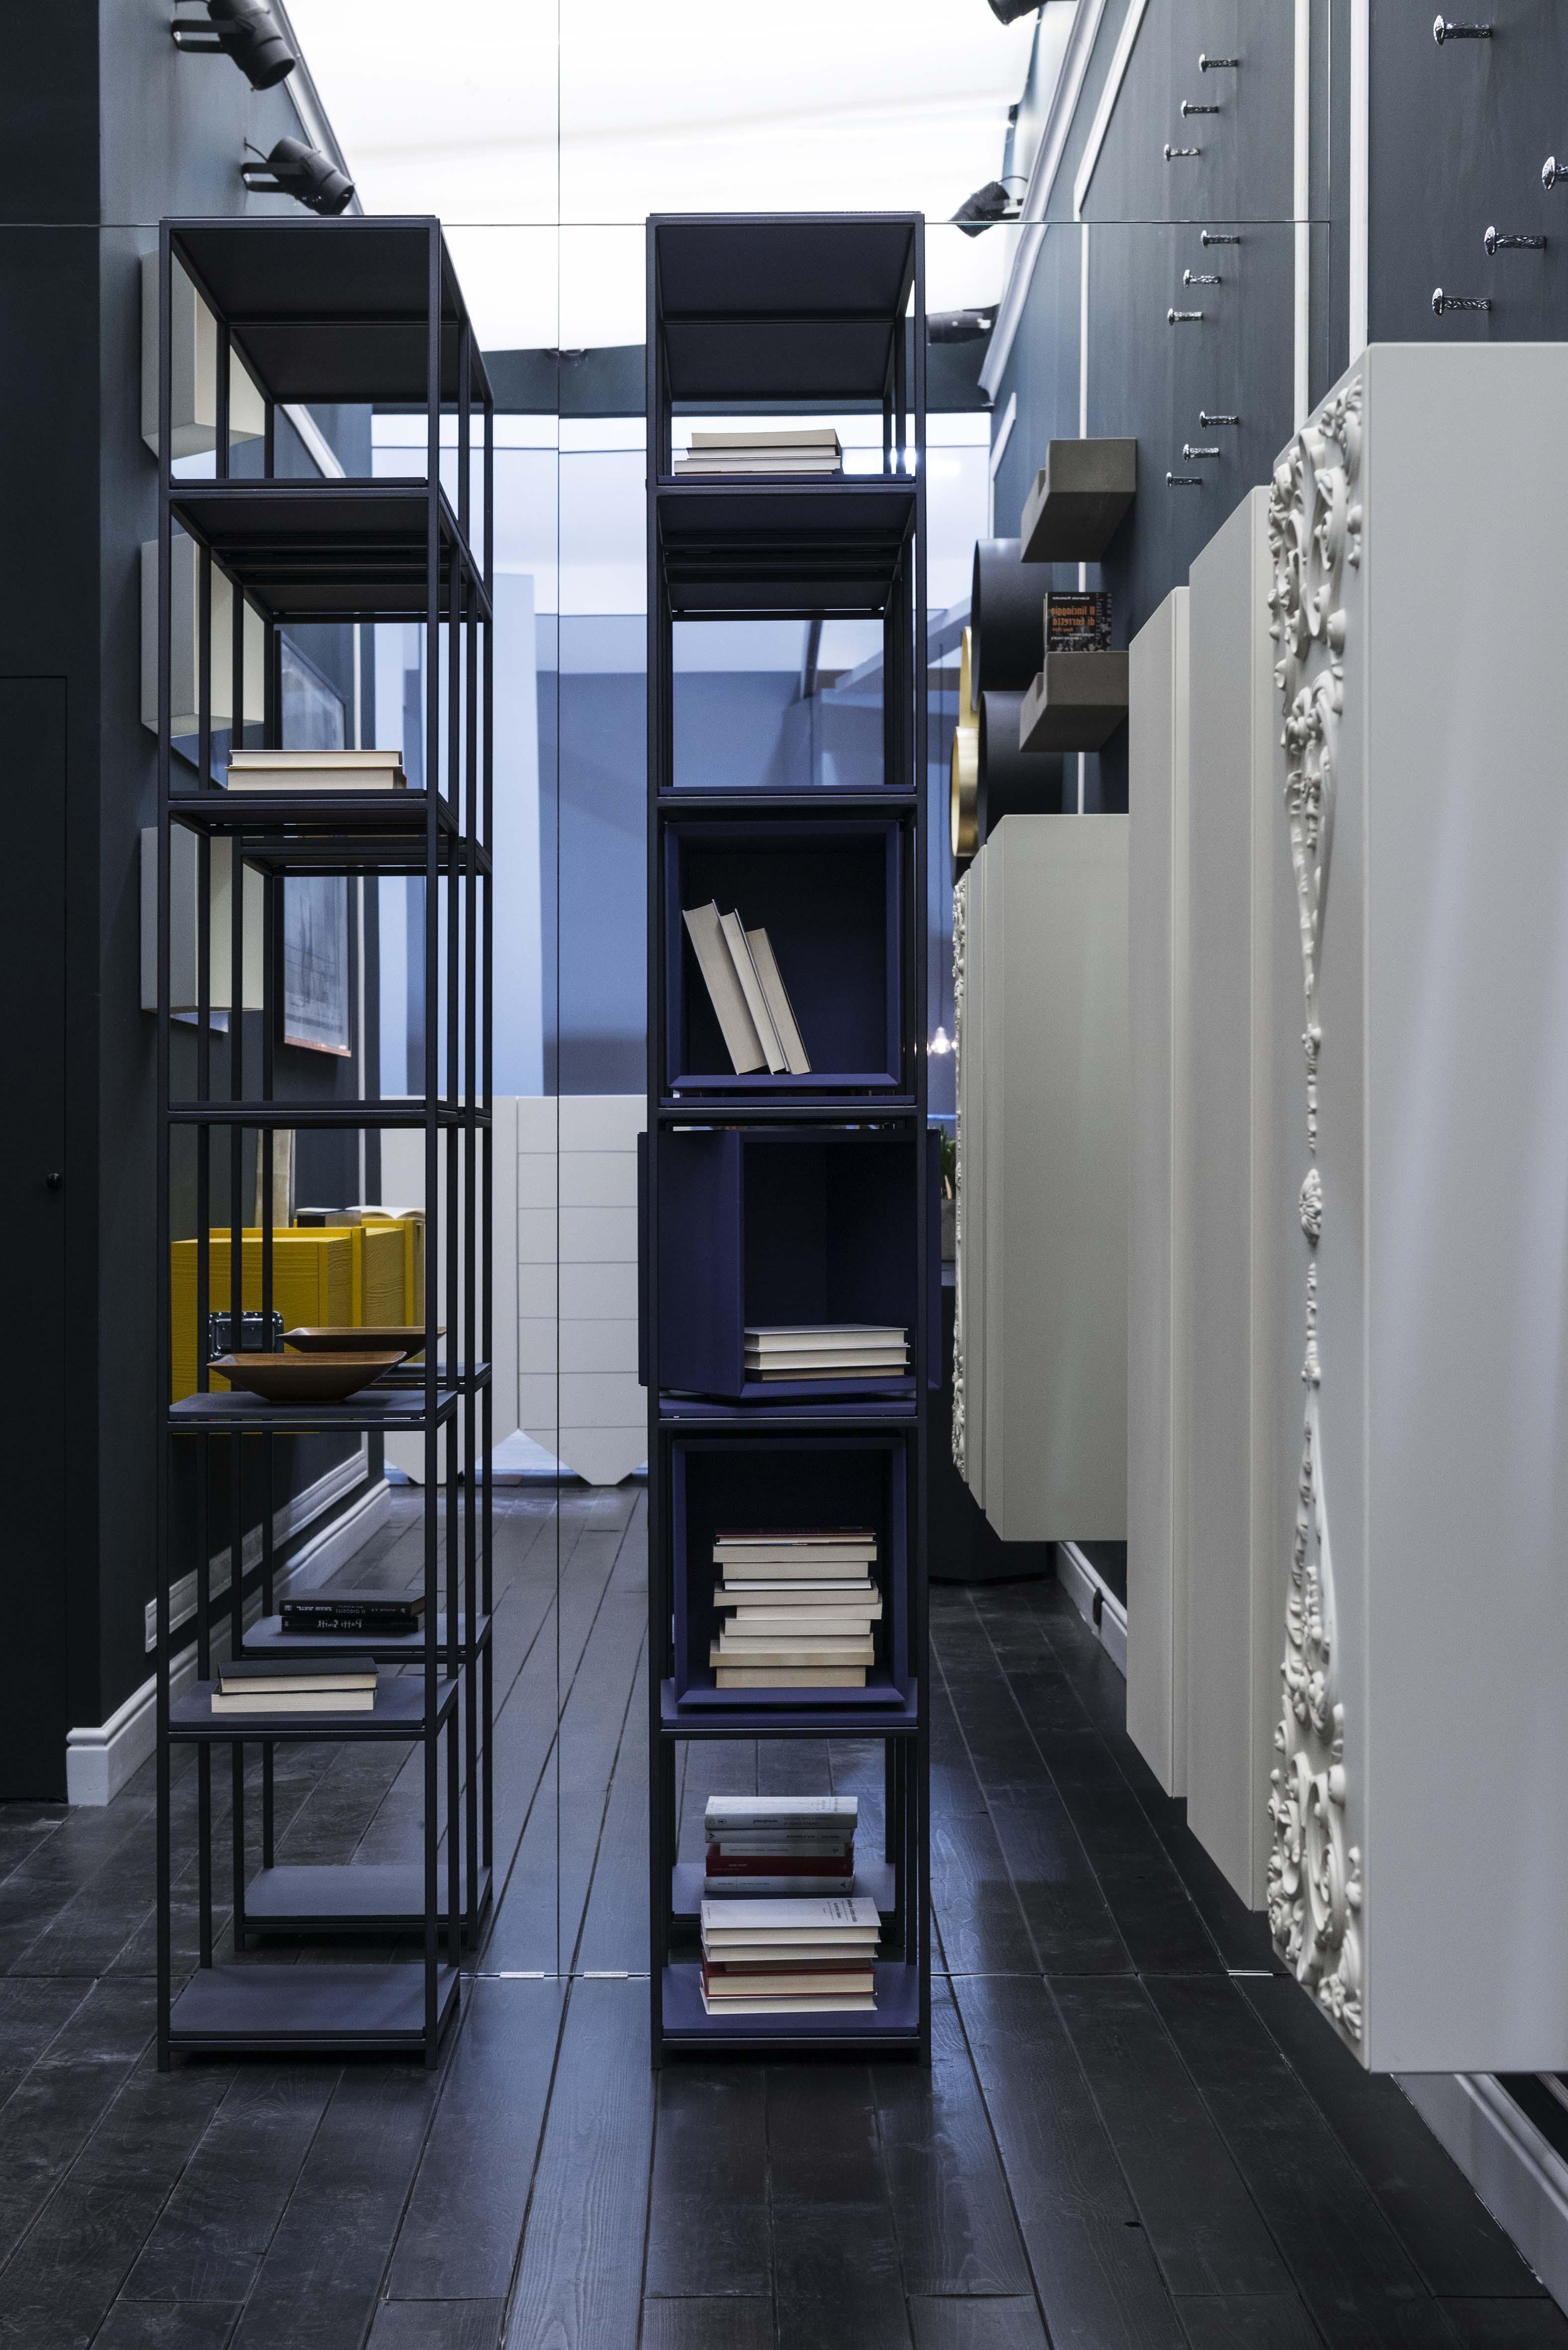 Michele Mantovani Studio